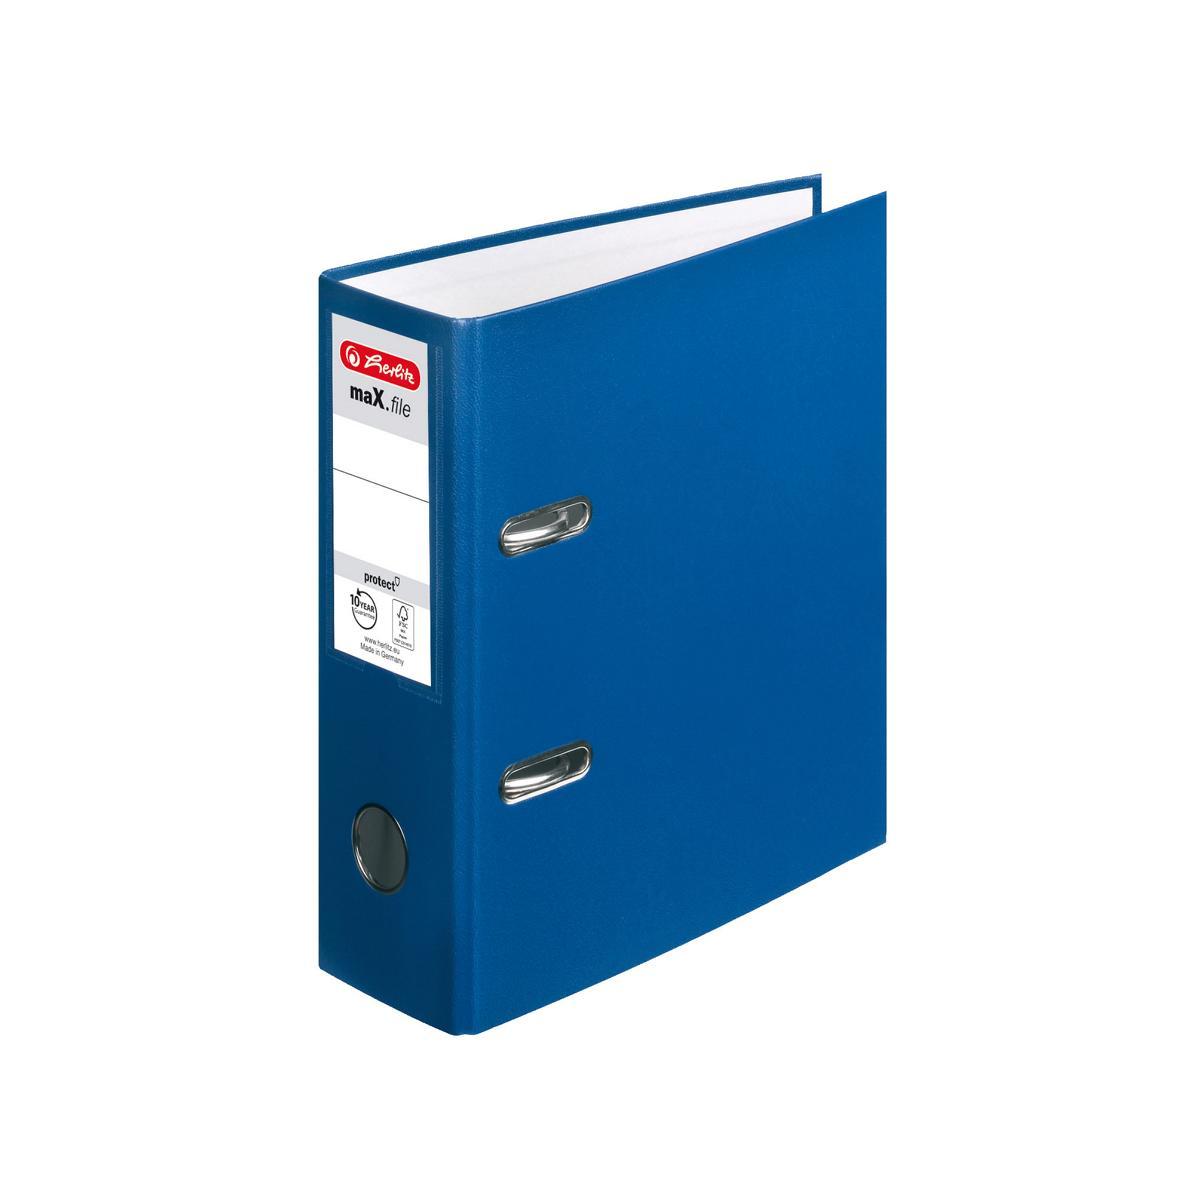 Herlitz Ordner Din A5 80mm Breit Farbe Blau Ebay